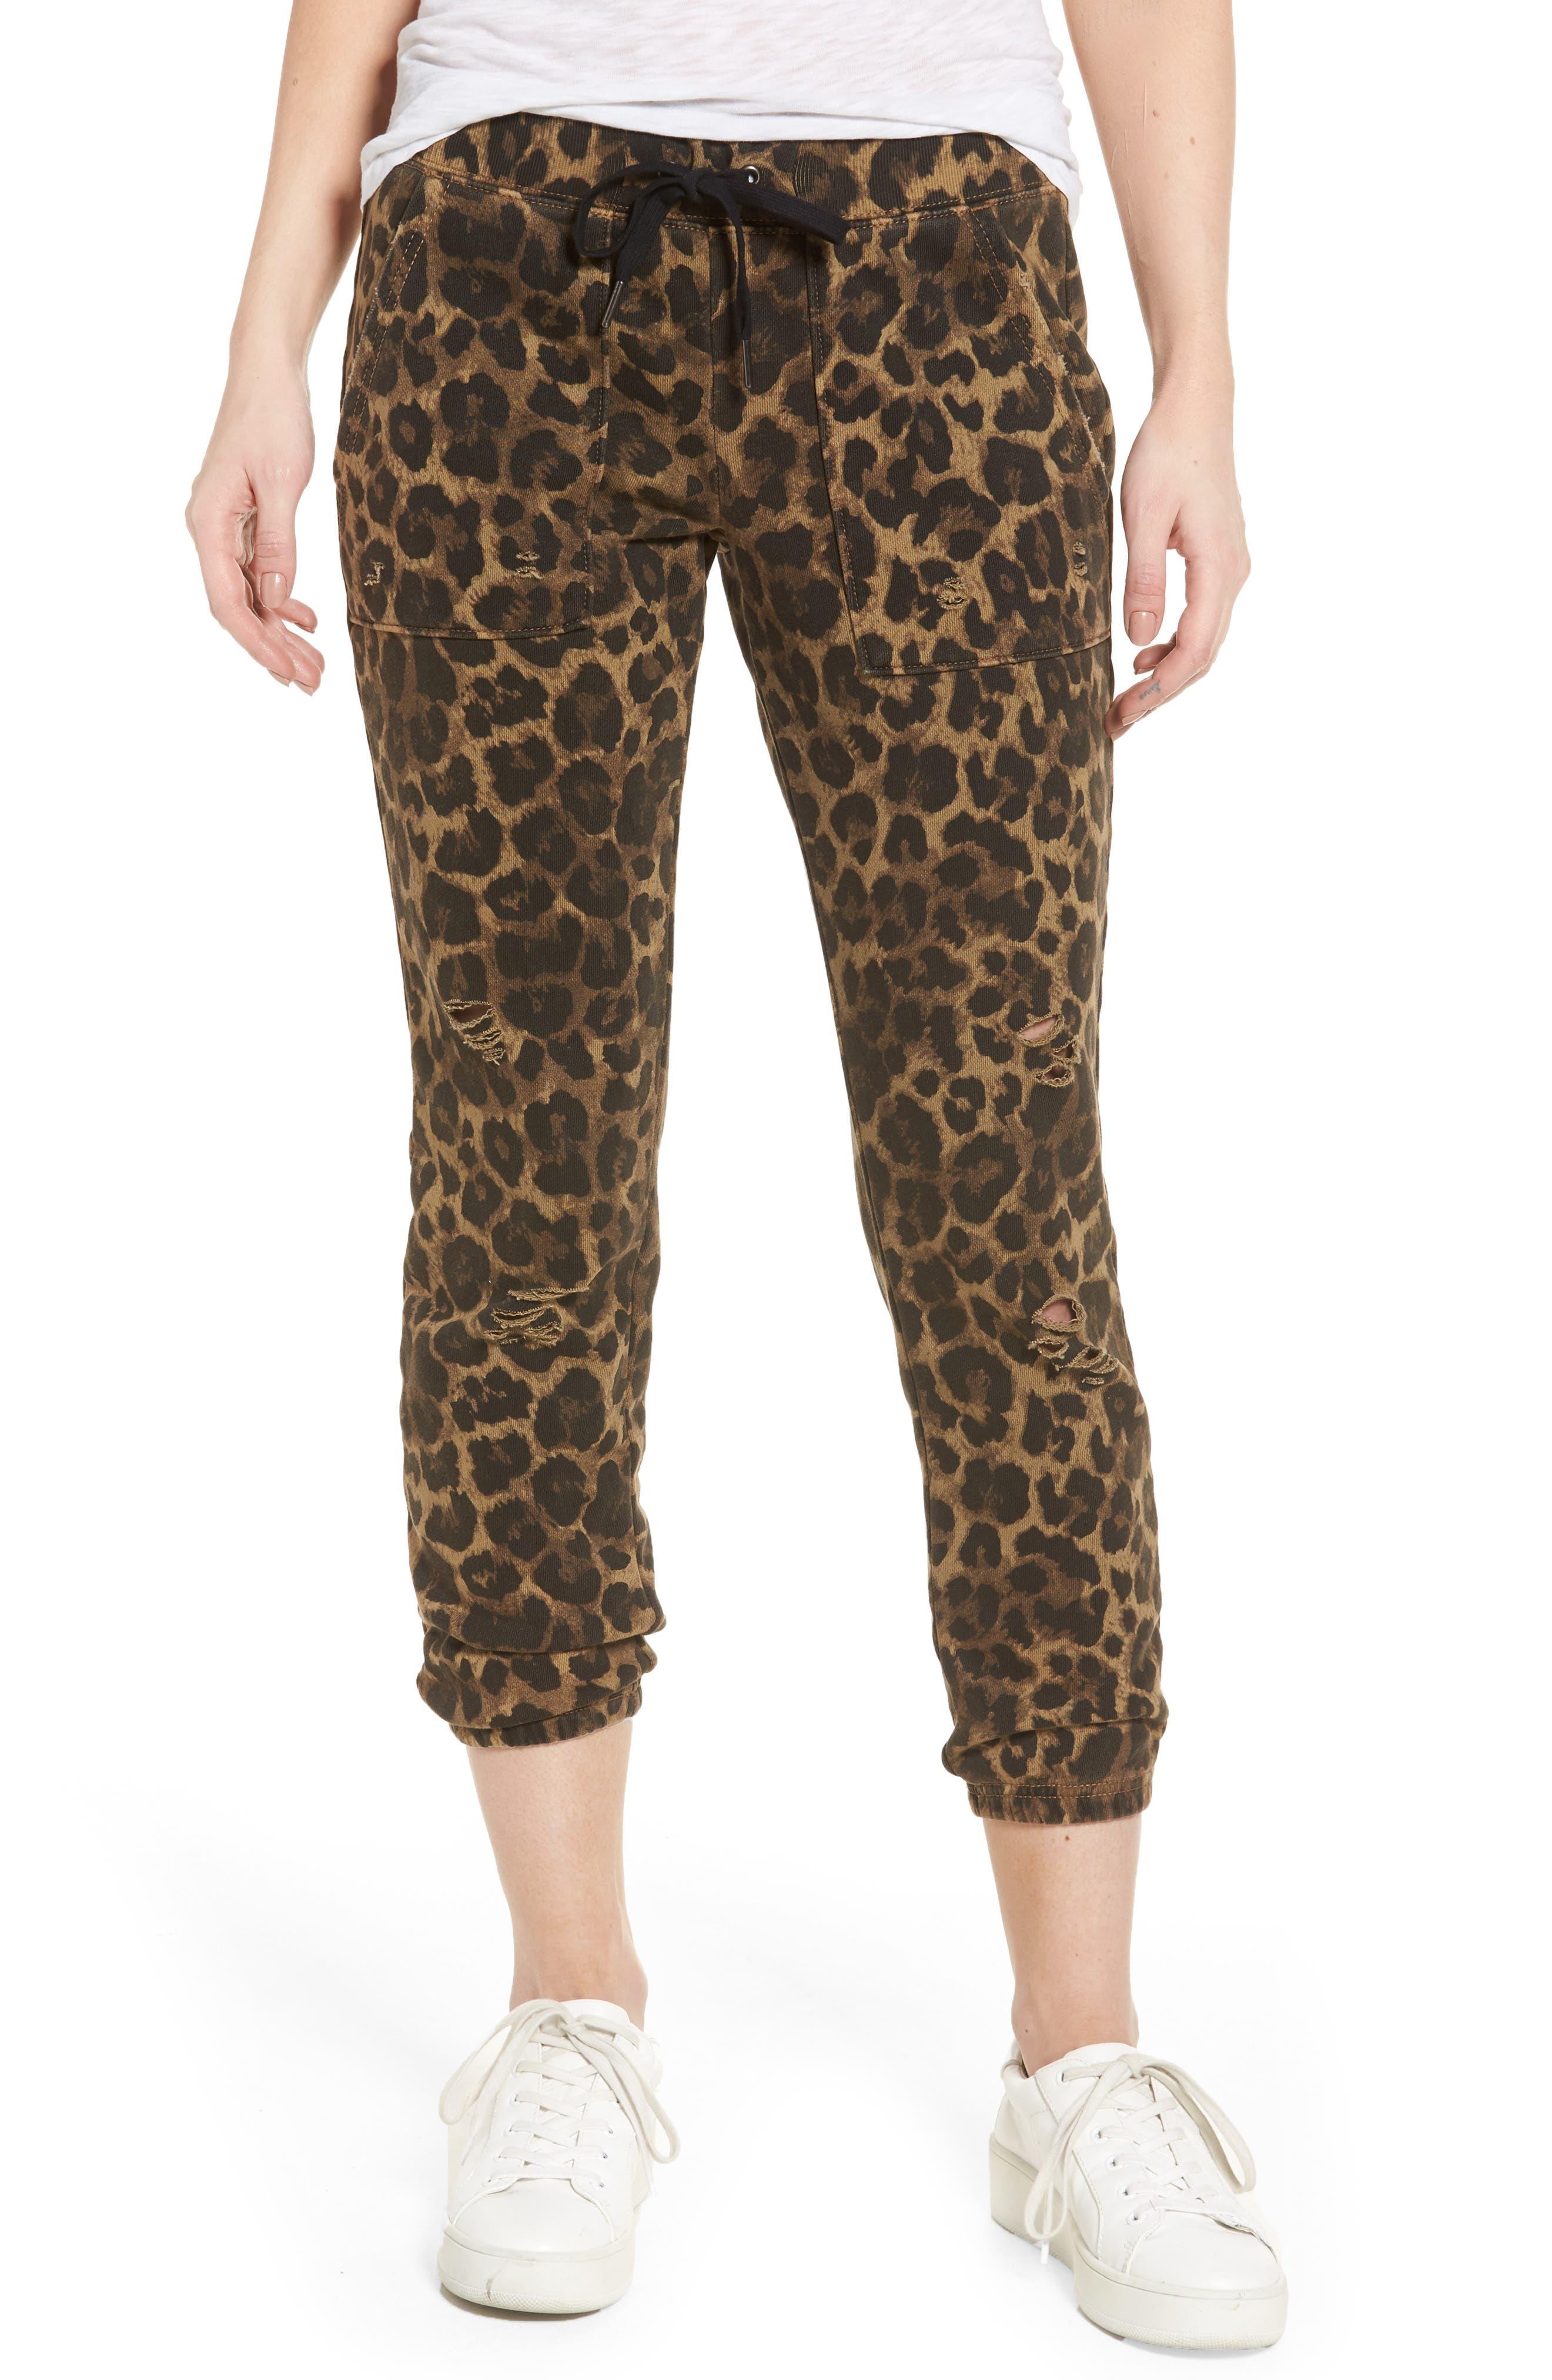 Pam & Gela Distressed Leopard Print Sweatpants